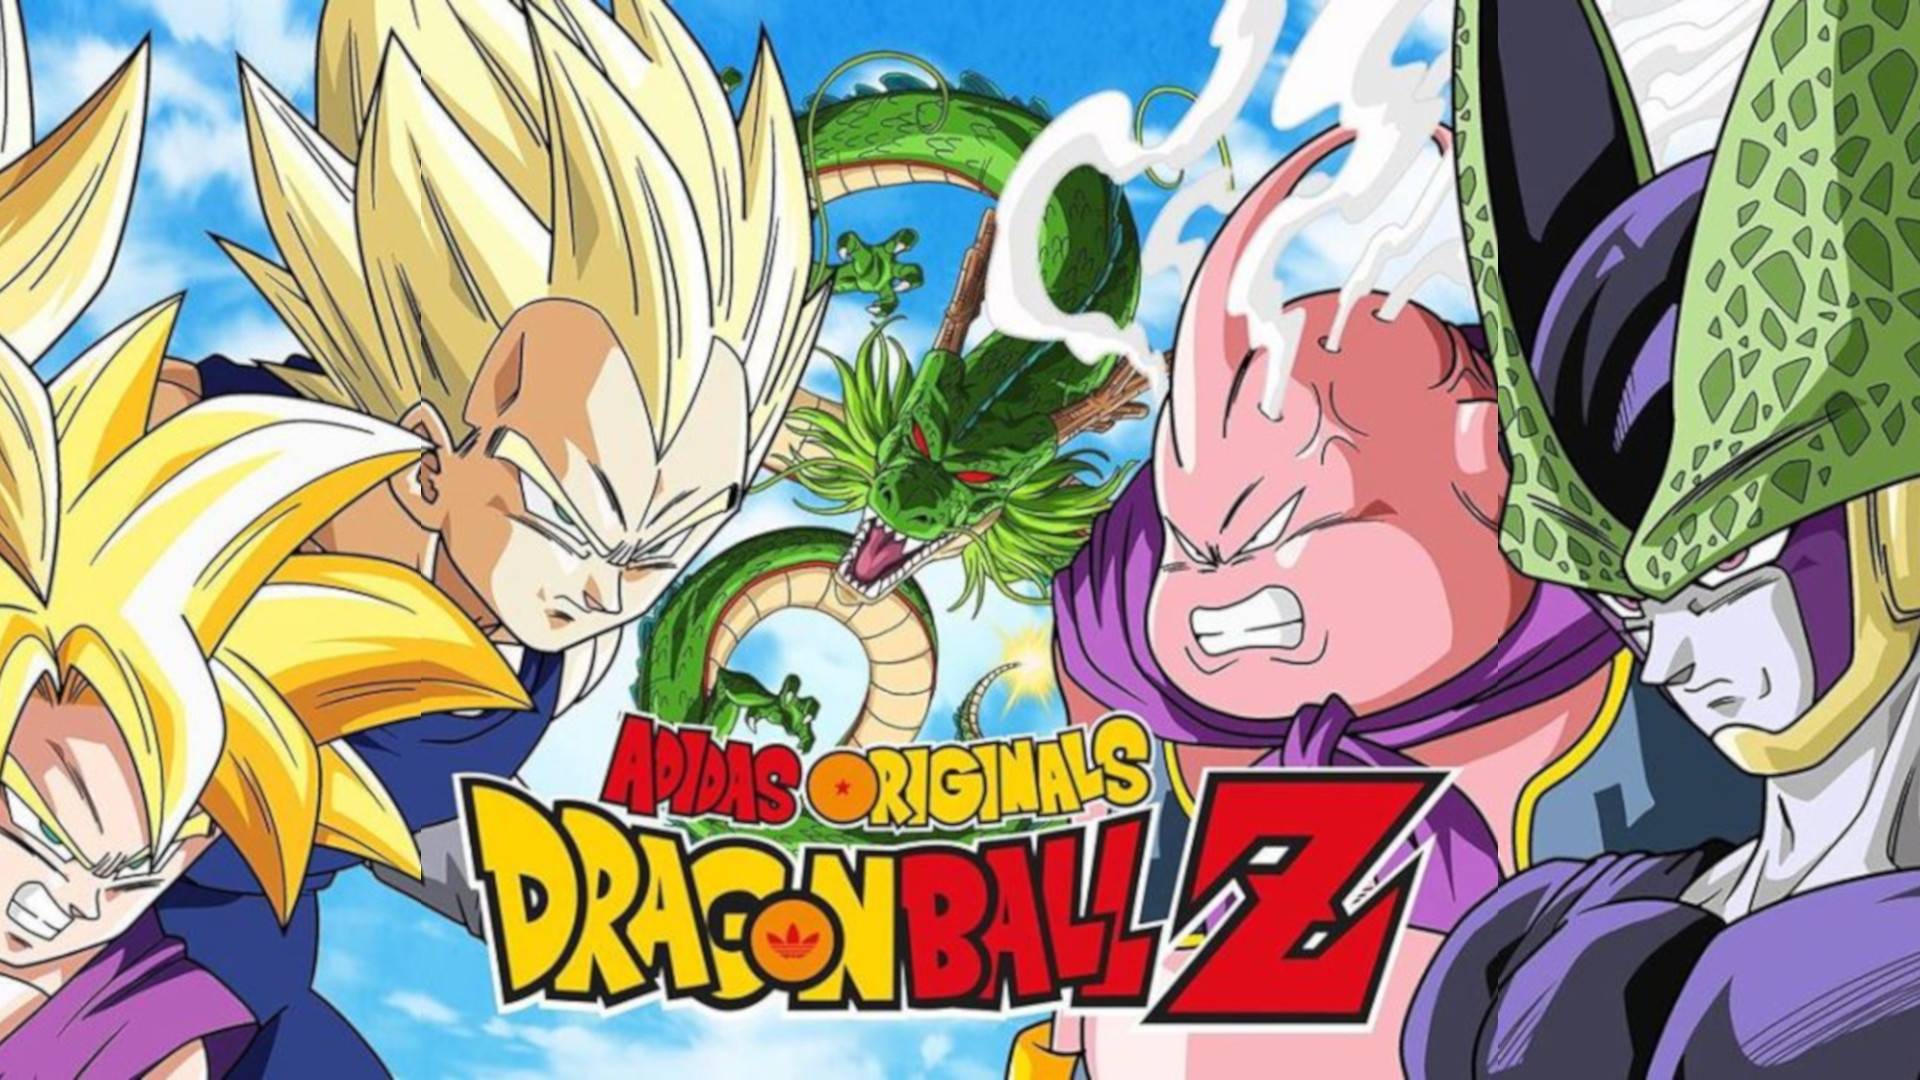 Dragon Ball Z x Adidas: Offizielle Bilder zu Goku & Freezer